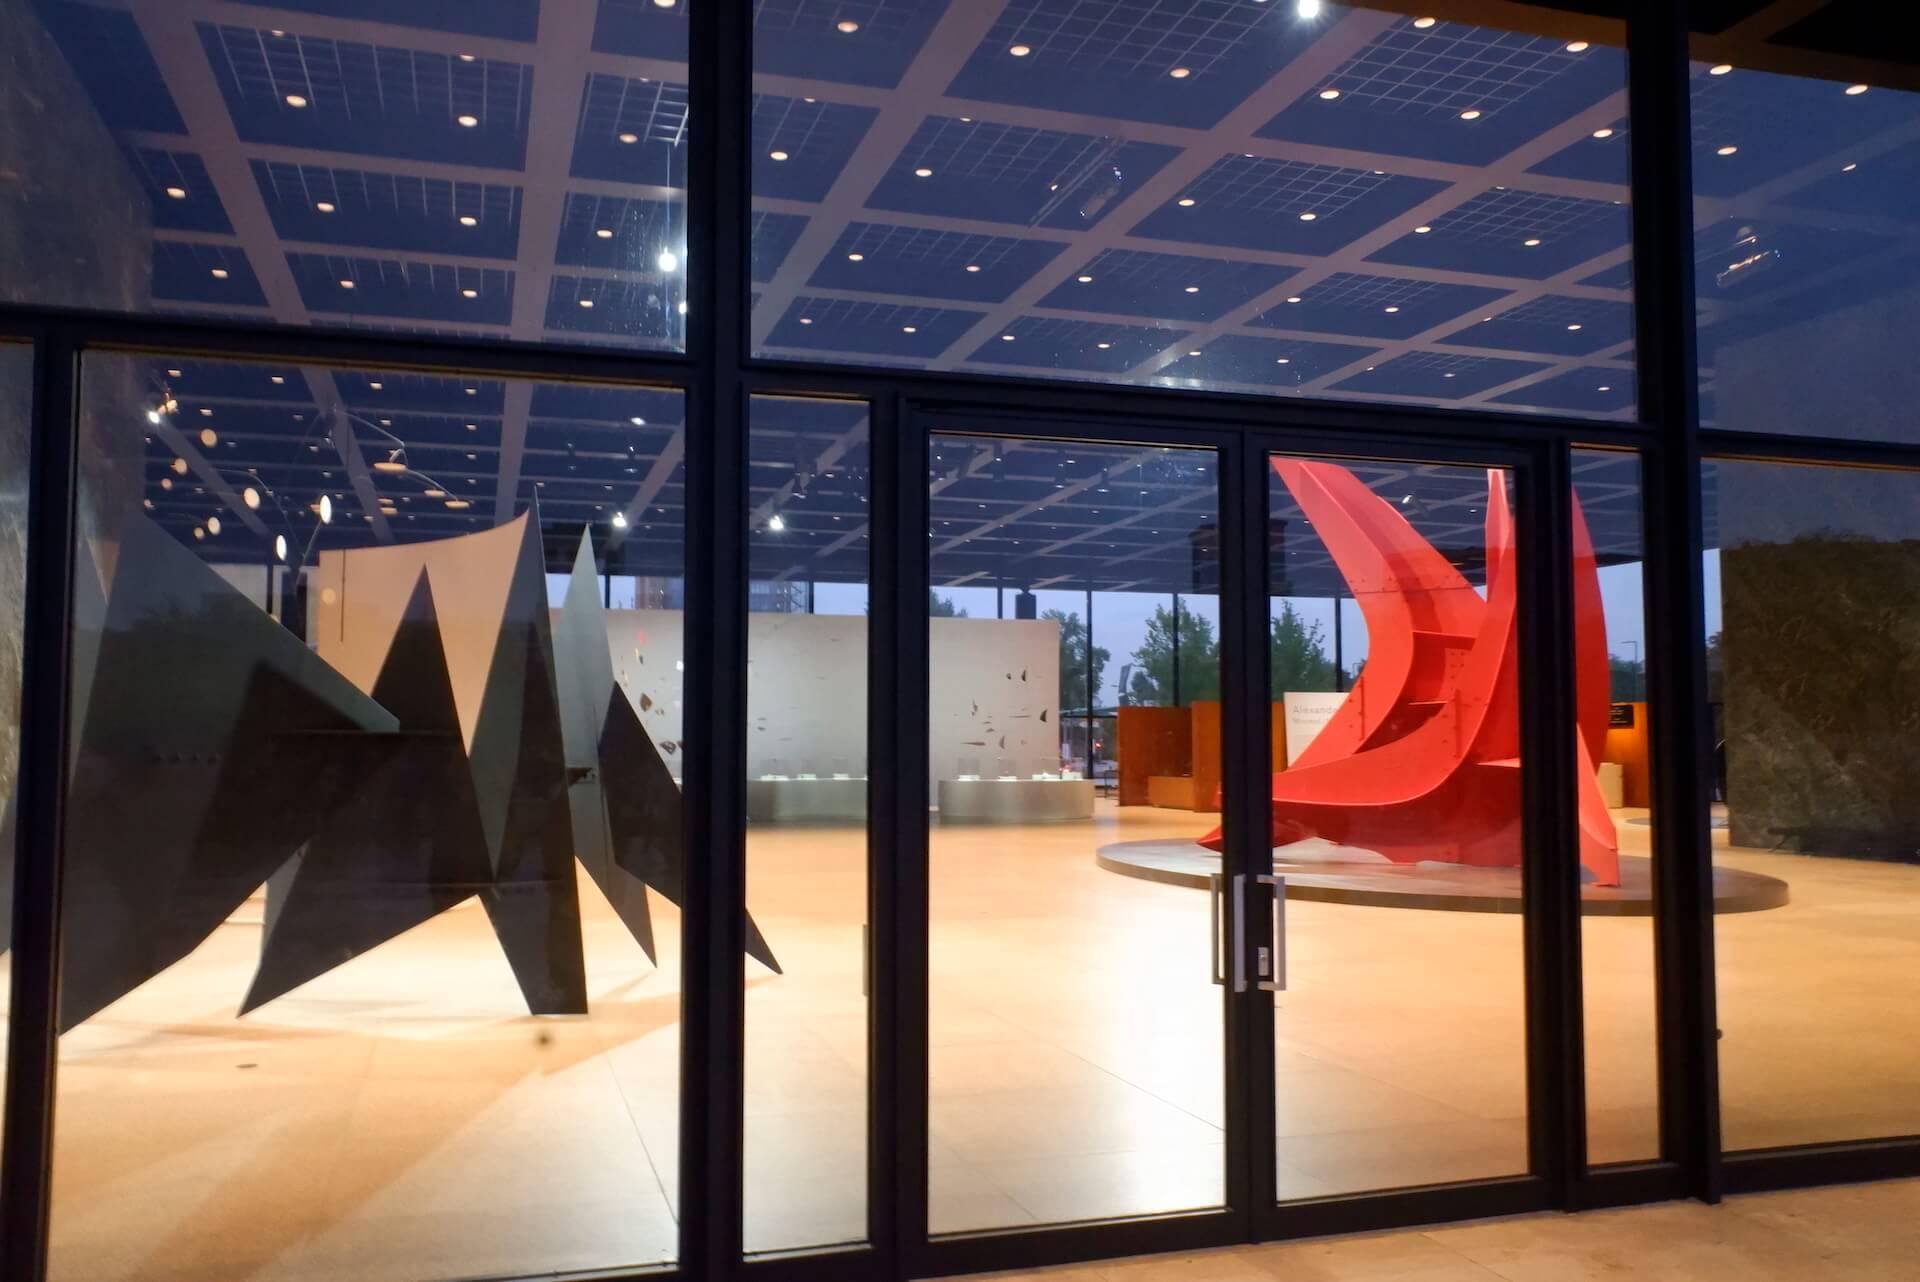 『Berlin Art Week』現地レポート 進化し変化し続けるベルリンのアートカルチャー column210929kana-miyazawa-03